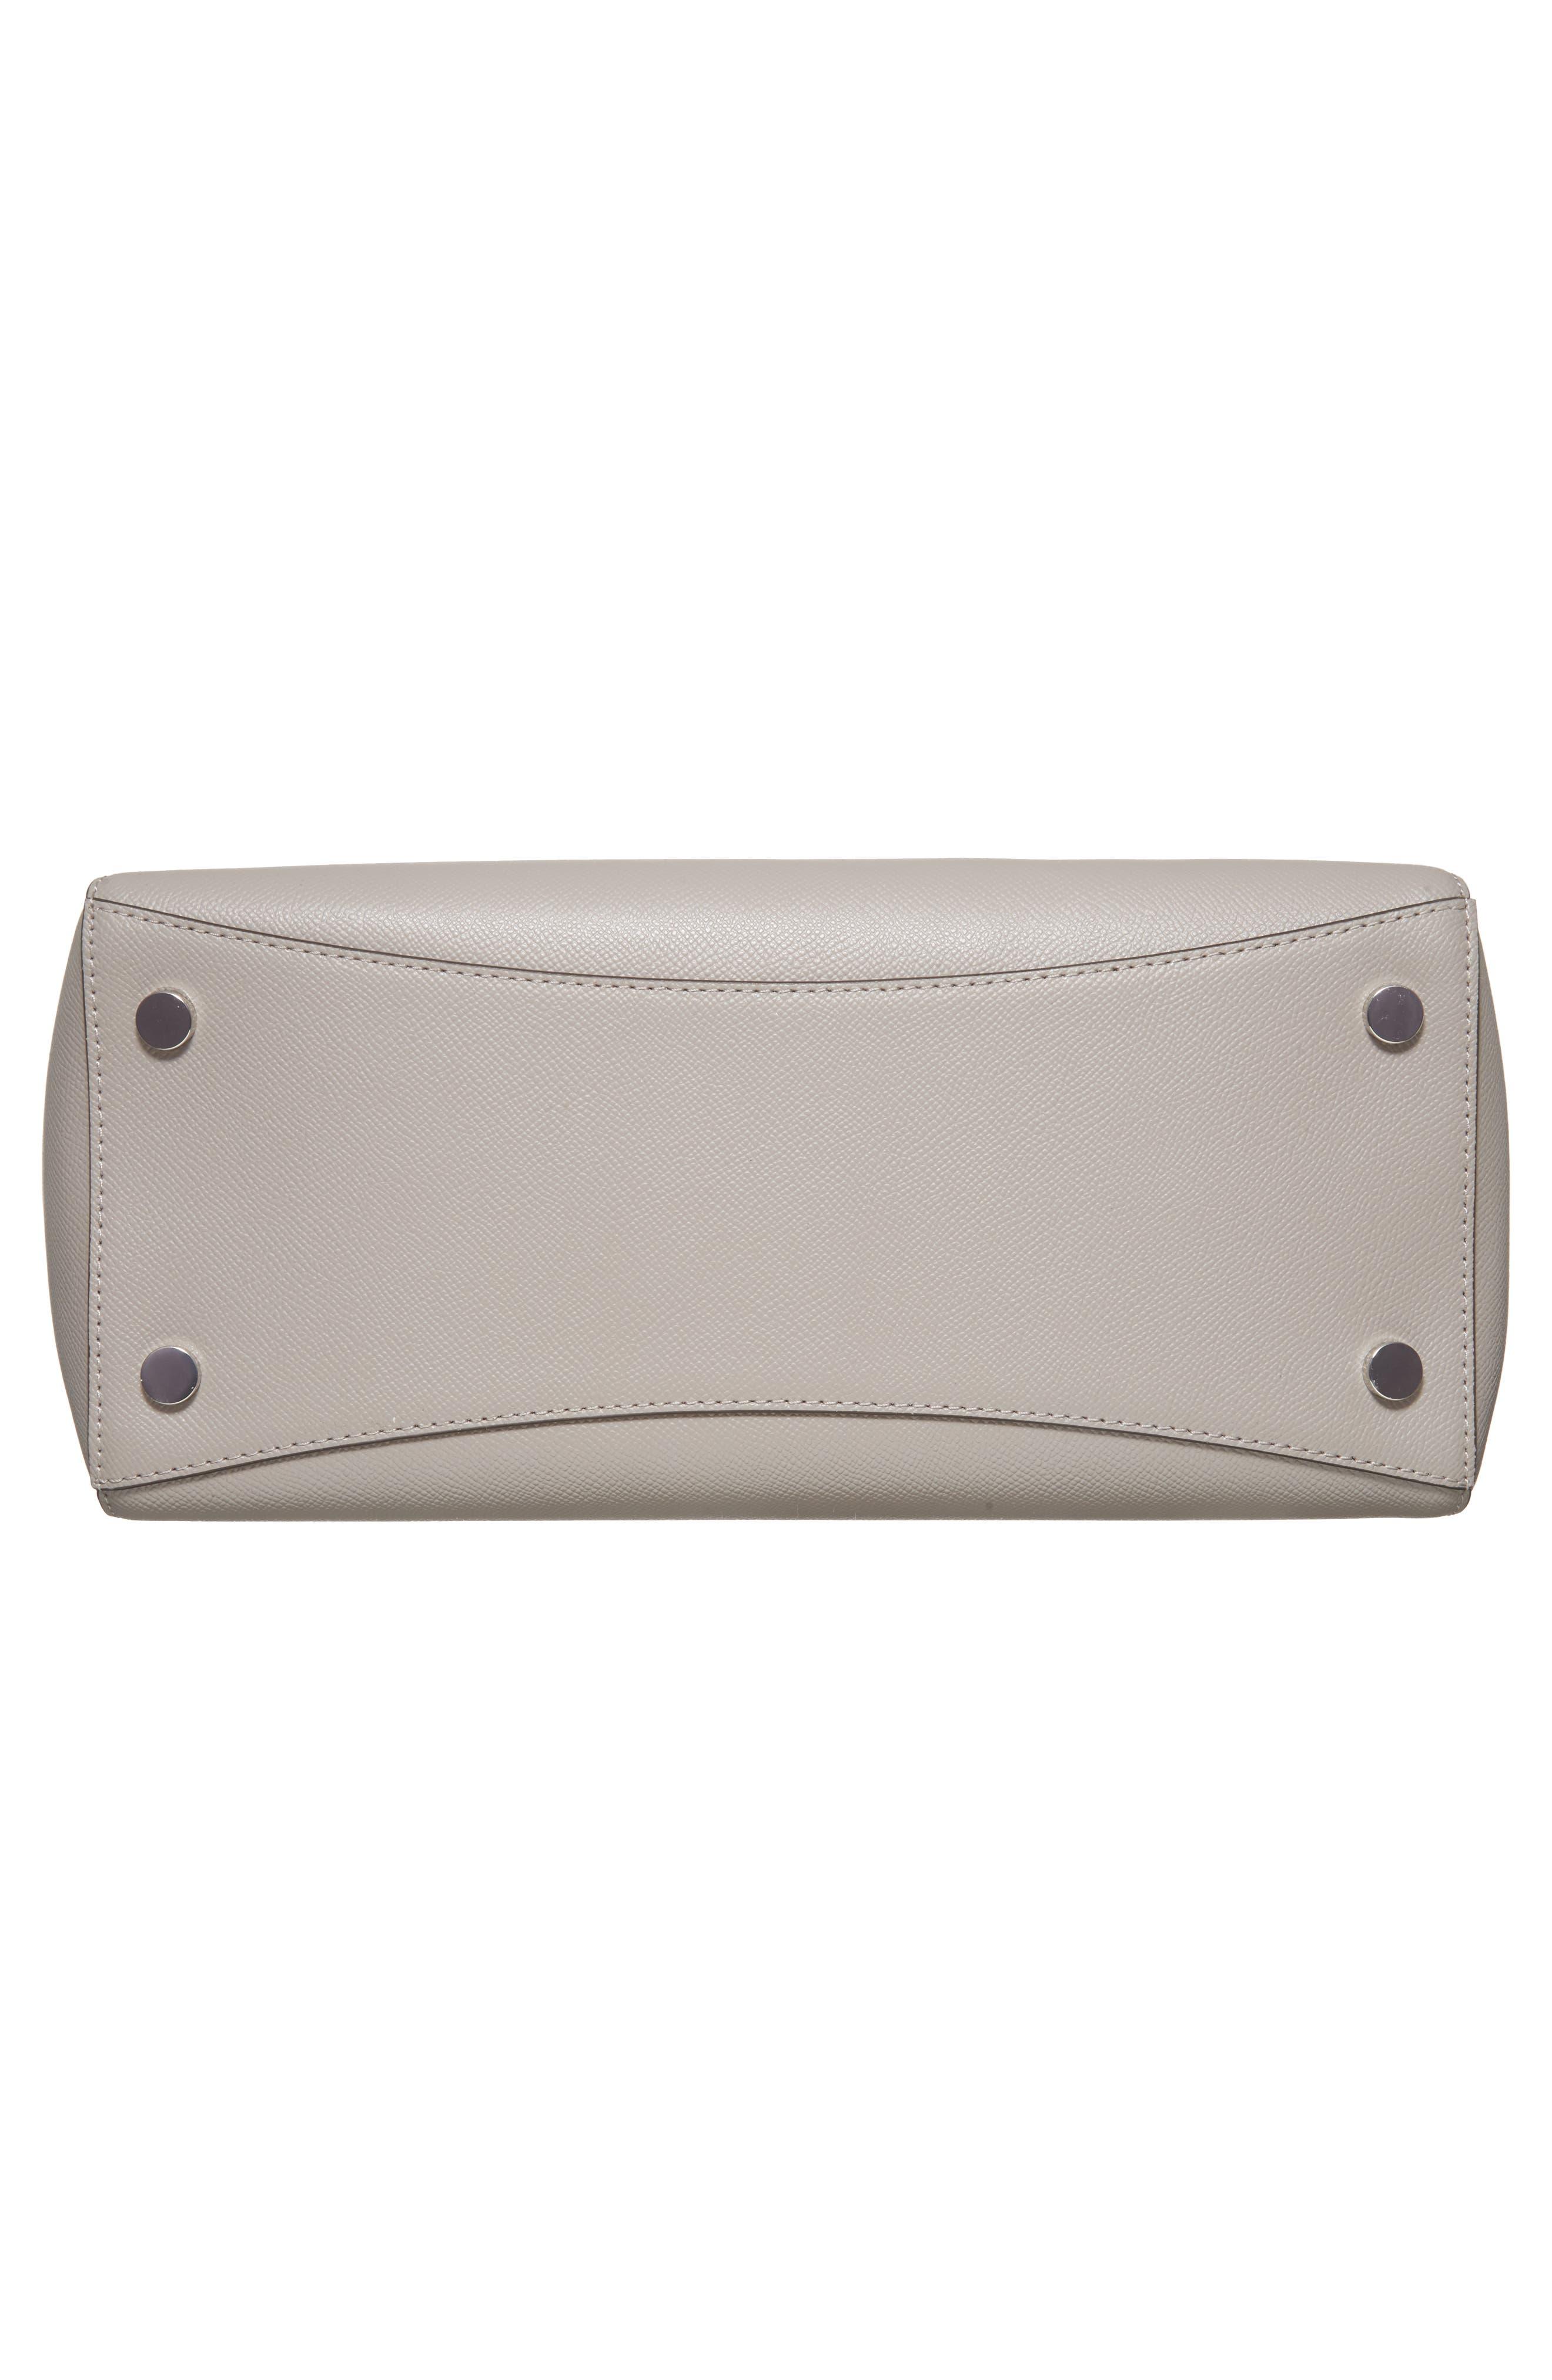 MICHAEL KORS,                             MICHAEL Michael Kors Voyager Leather Tote,                             Alternate thumbnail 6, color,                             081